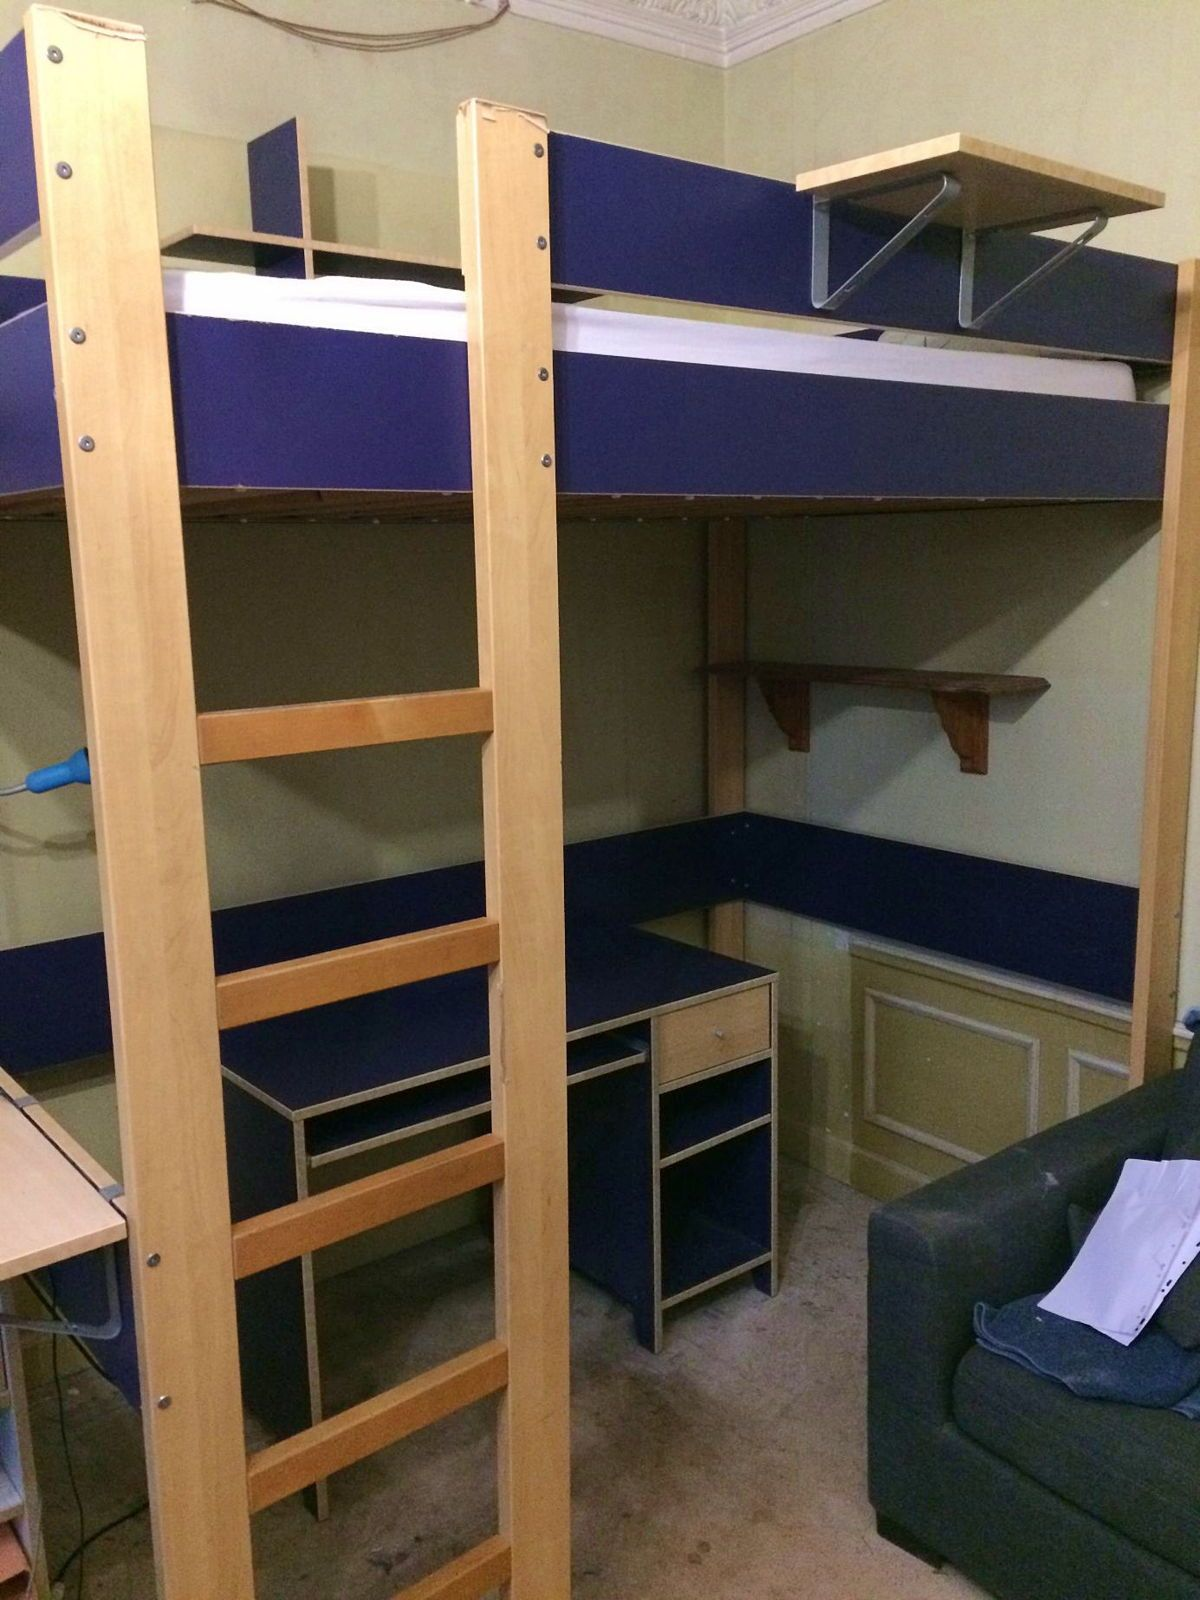 Mezzanine Ikea et son bureau assorti